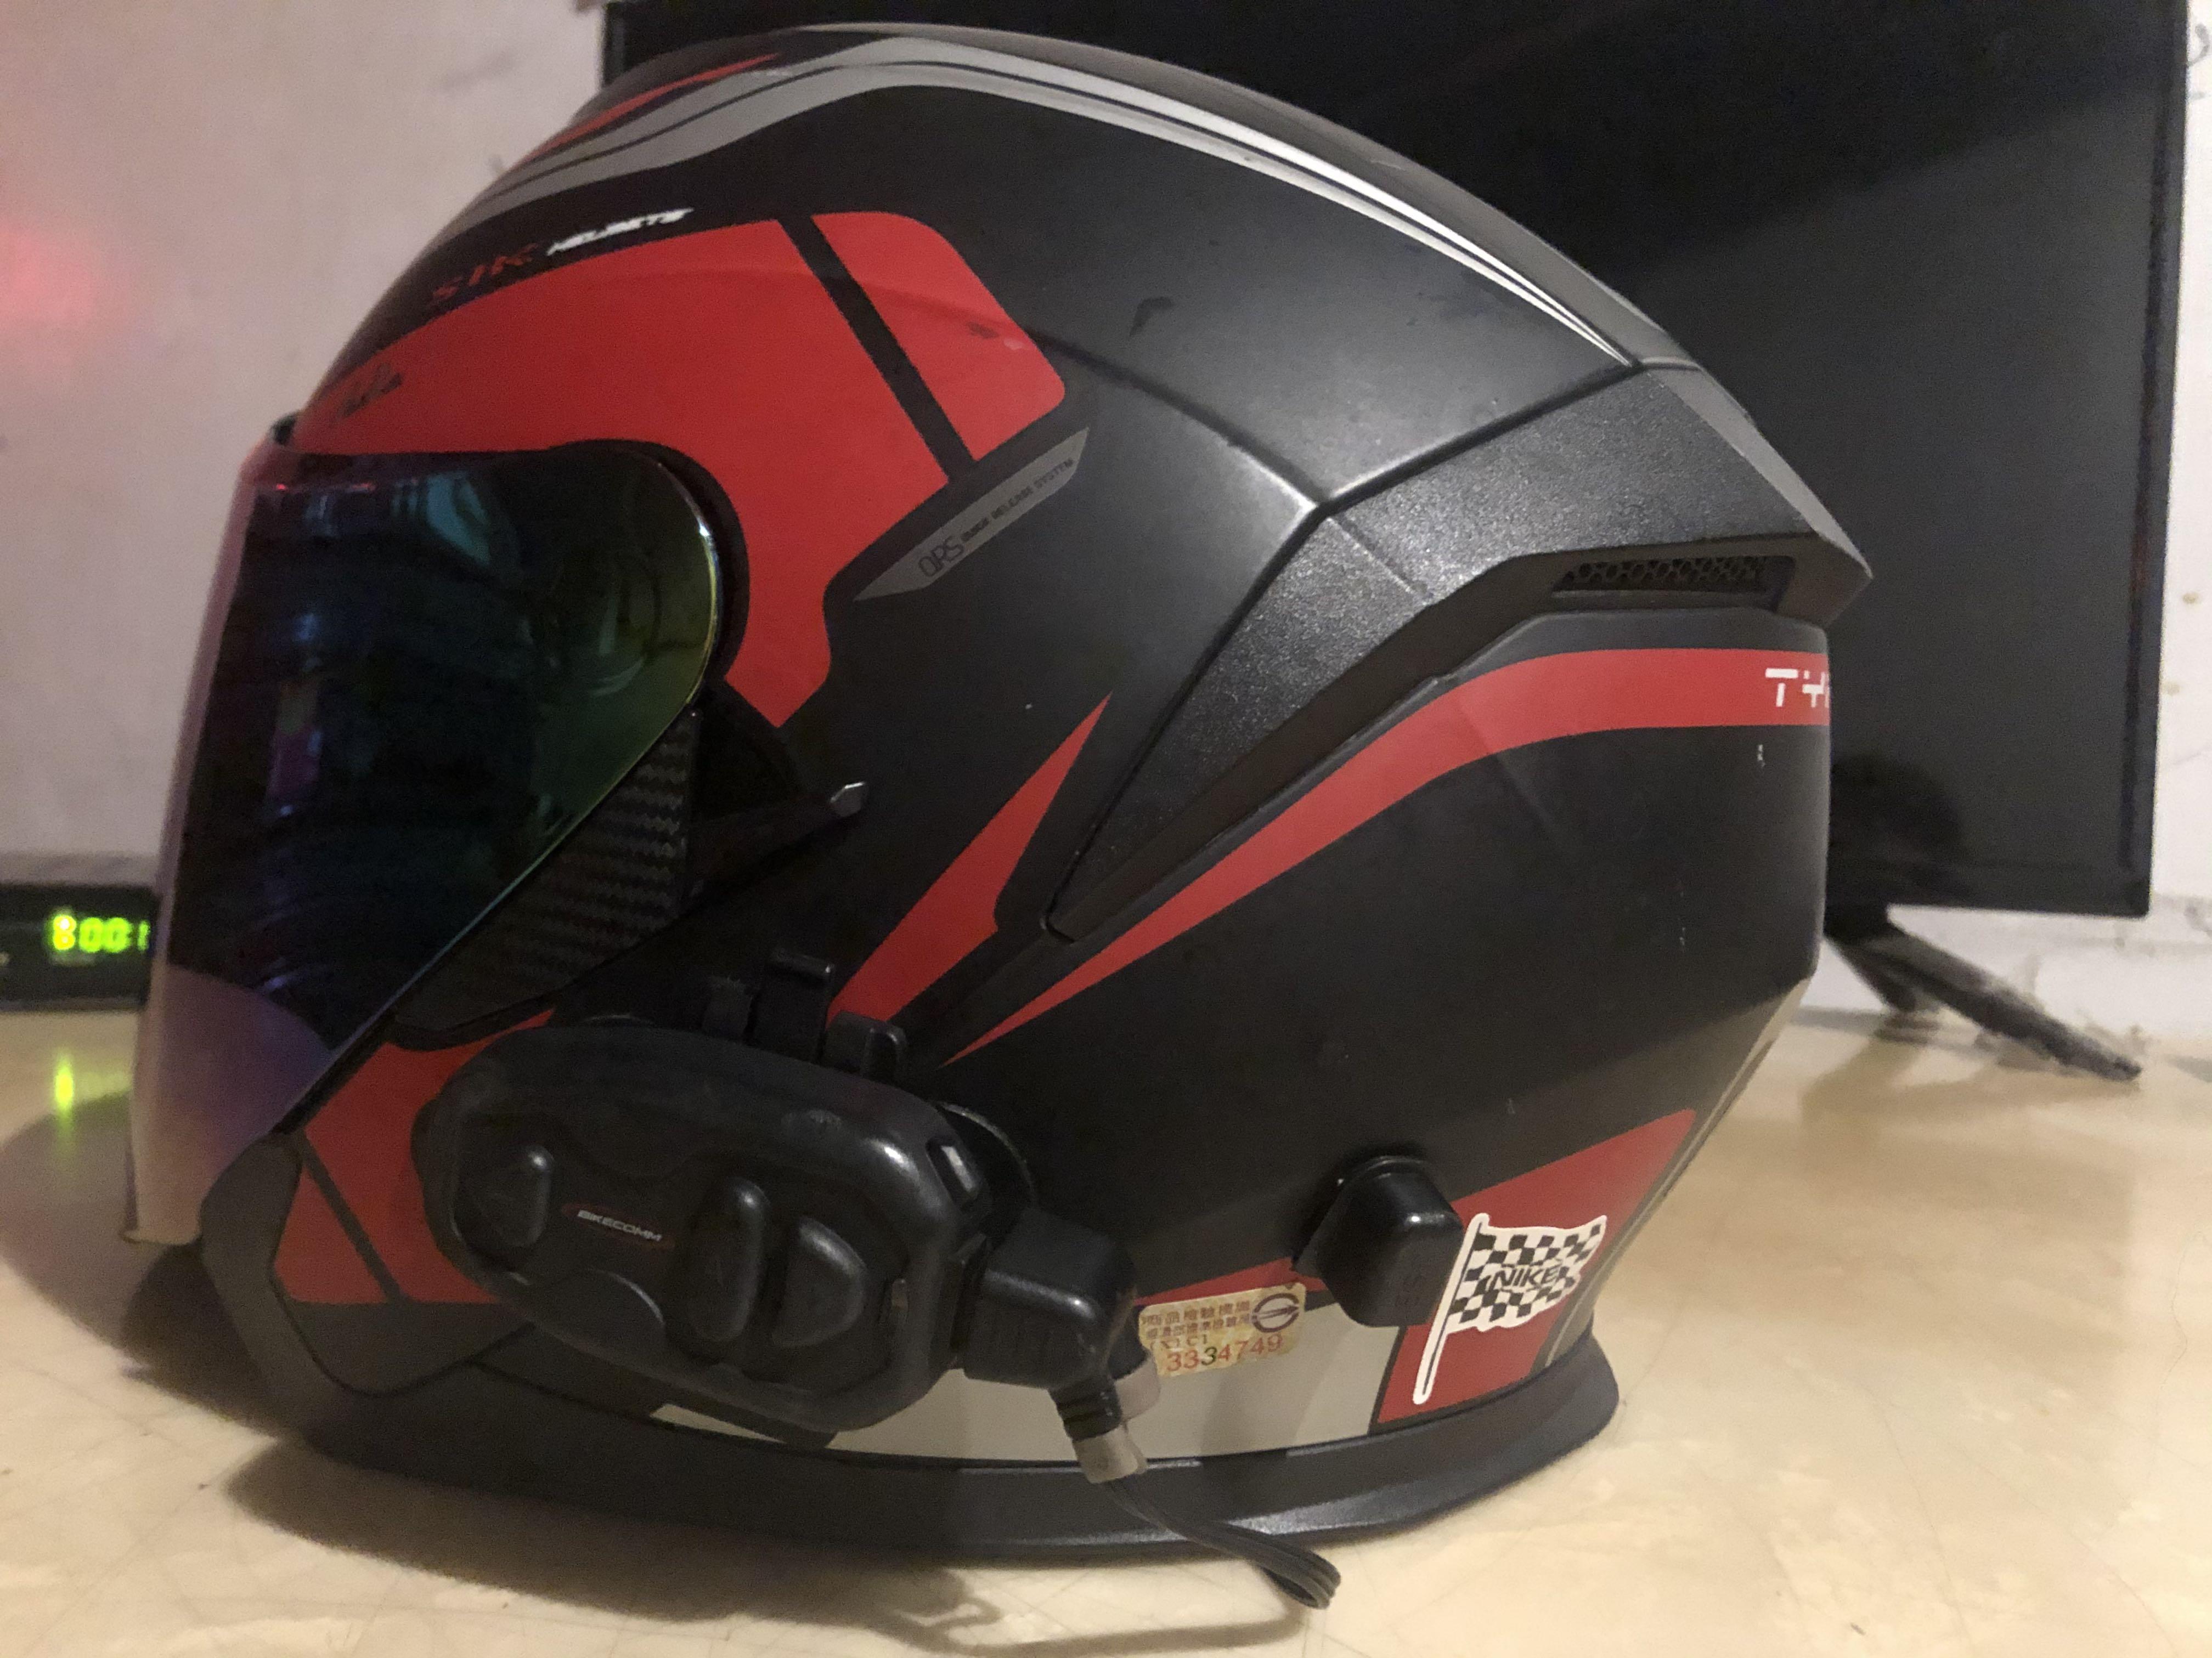 SBK type-s 黑紅